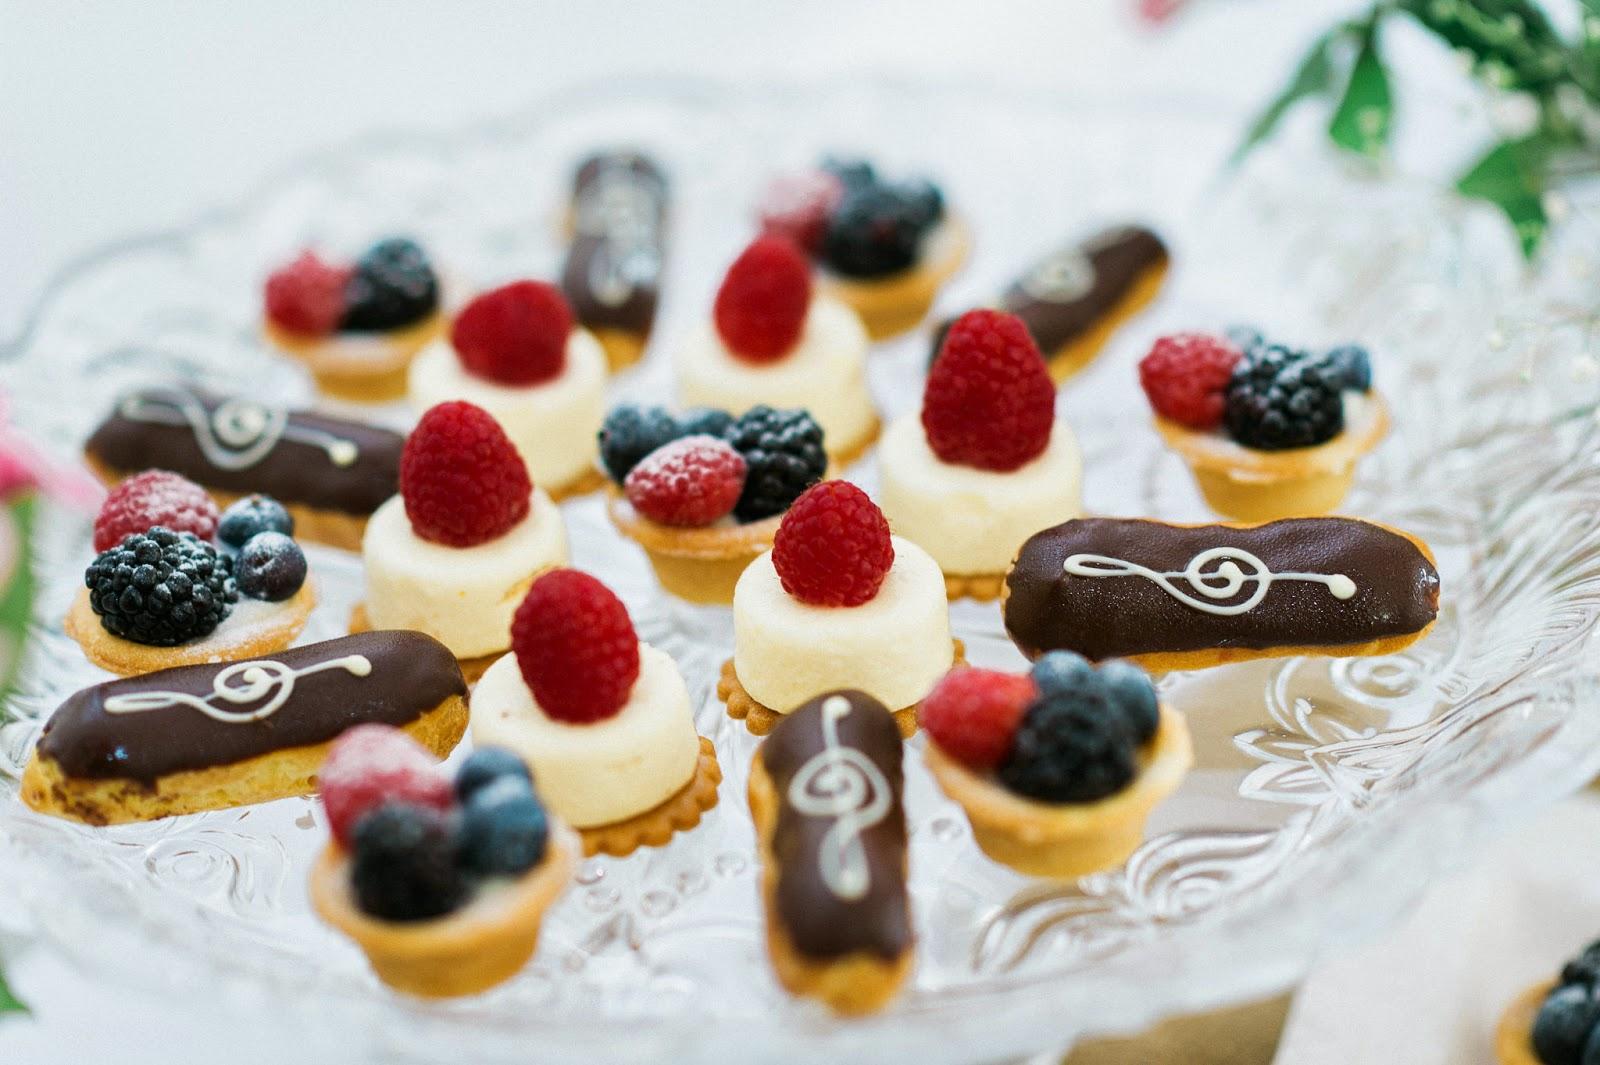 desserts close up